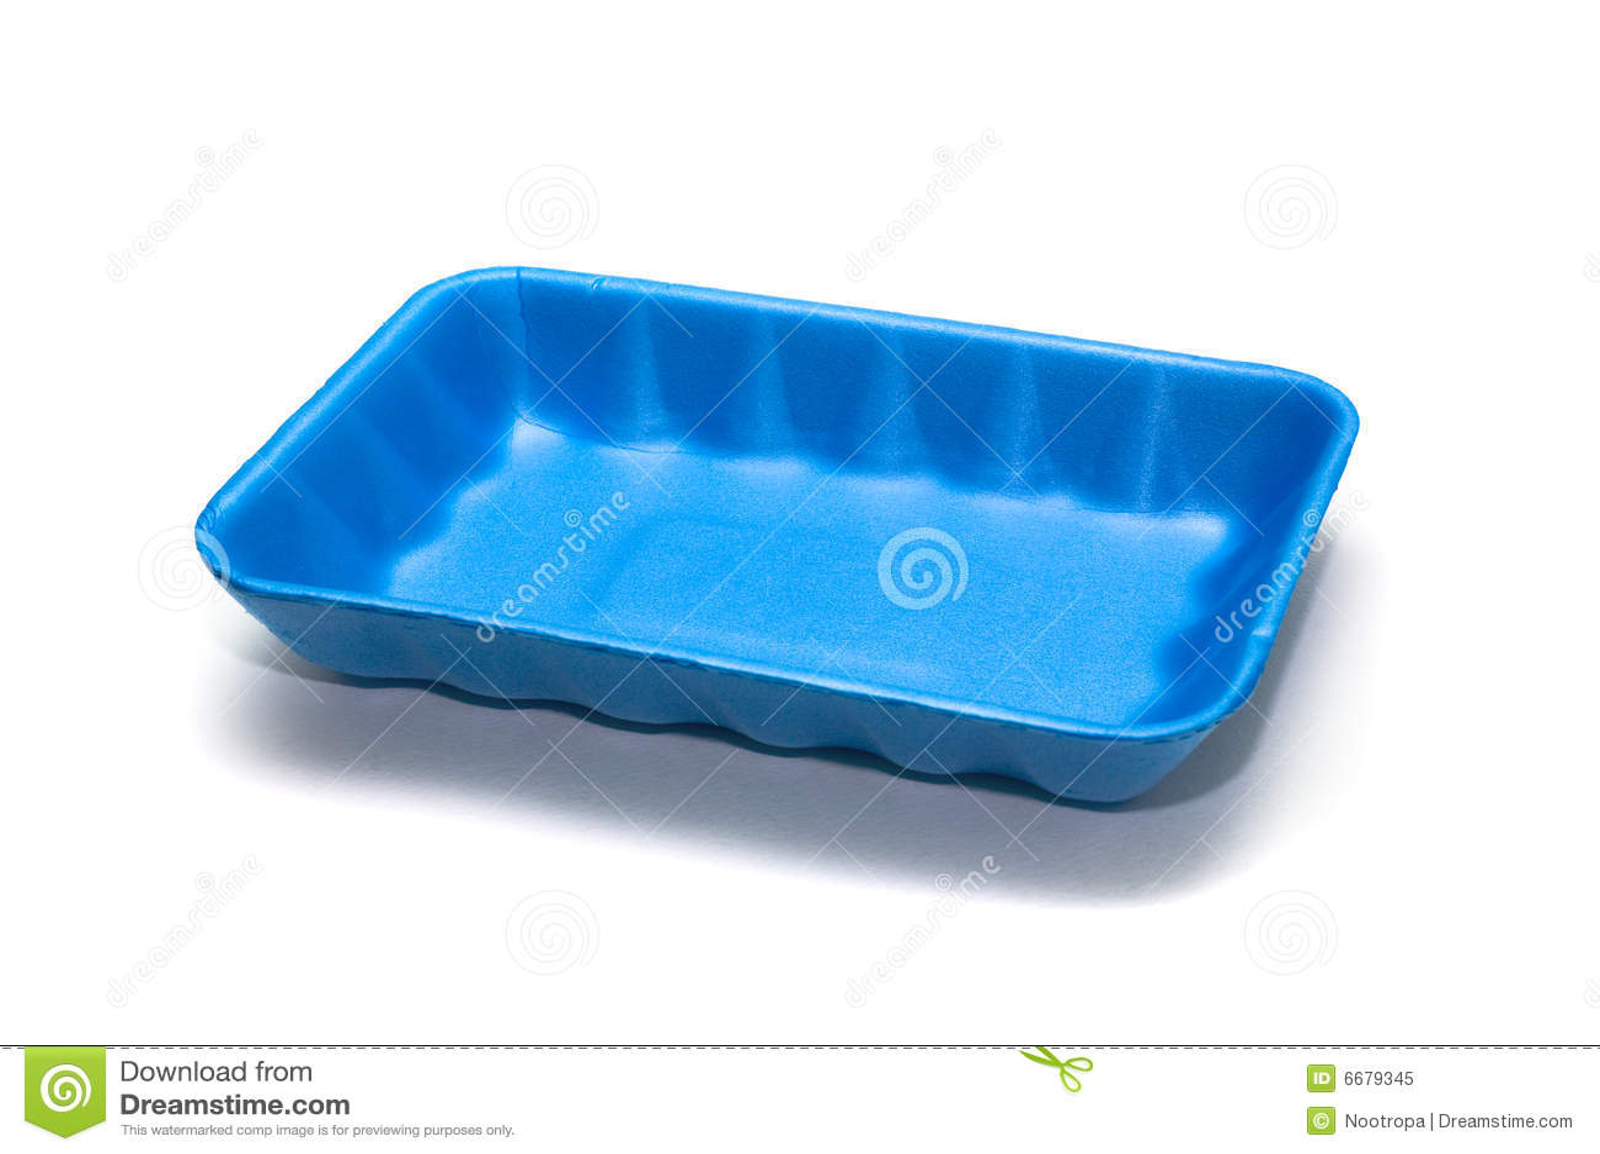 empty food tray clipart www pixshark com images lunch tray clipart with kids Lunch Box Clip Art